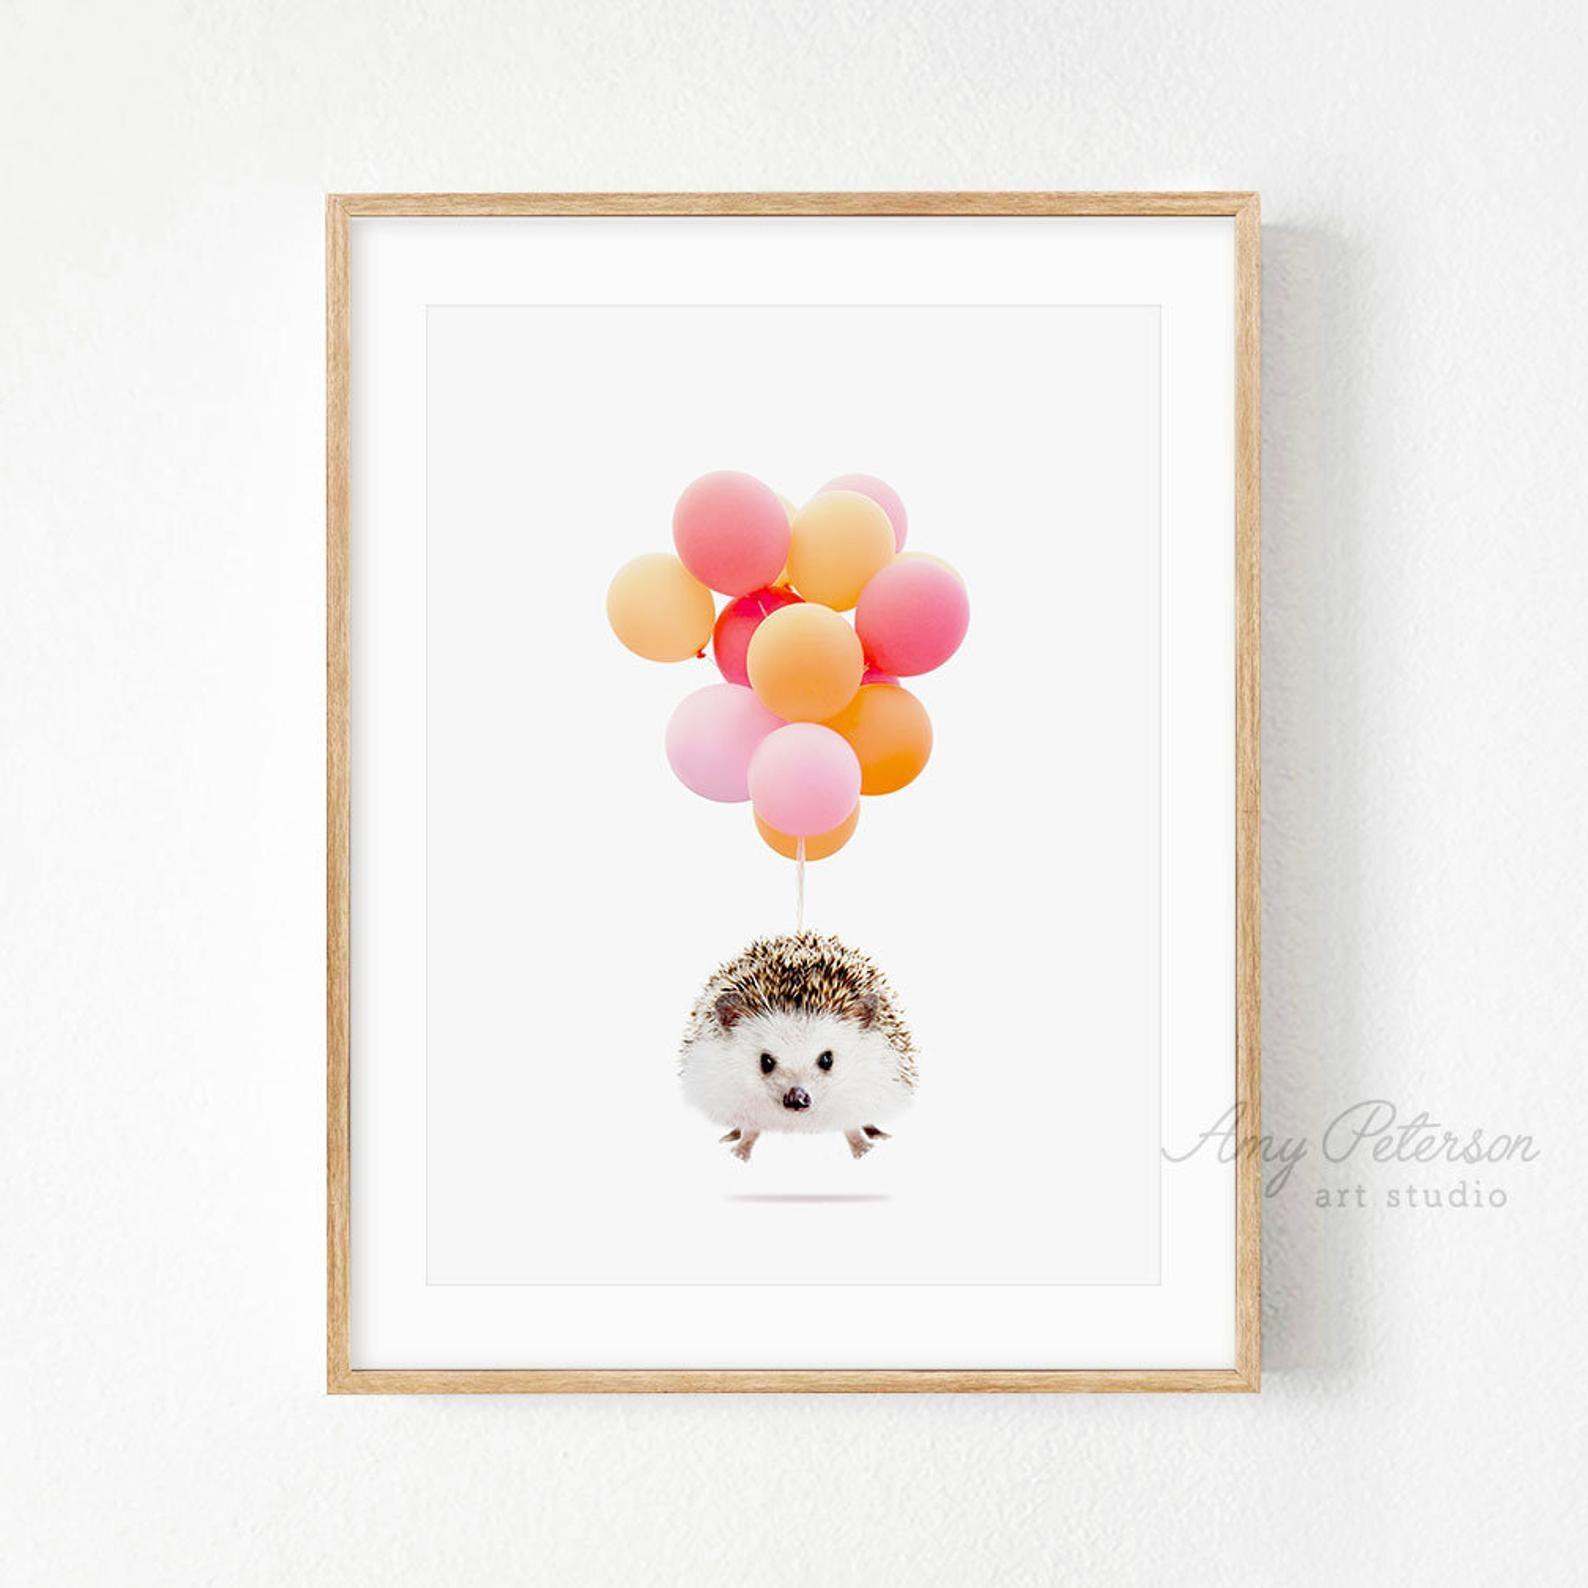 Hedgehog balloons print funny hedgehog art print whimsy